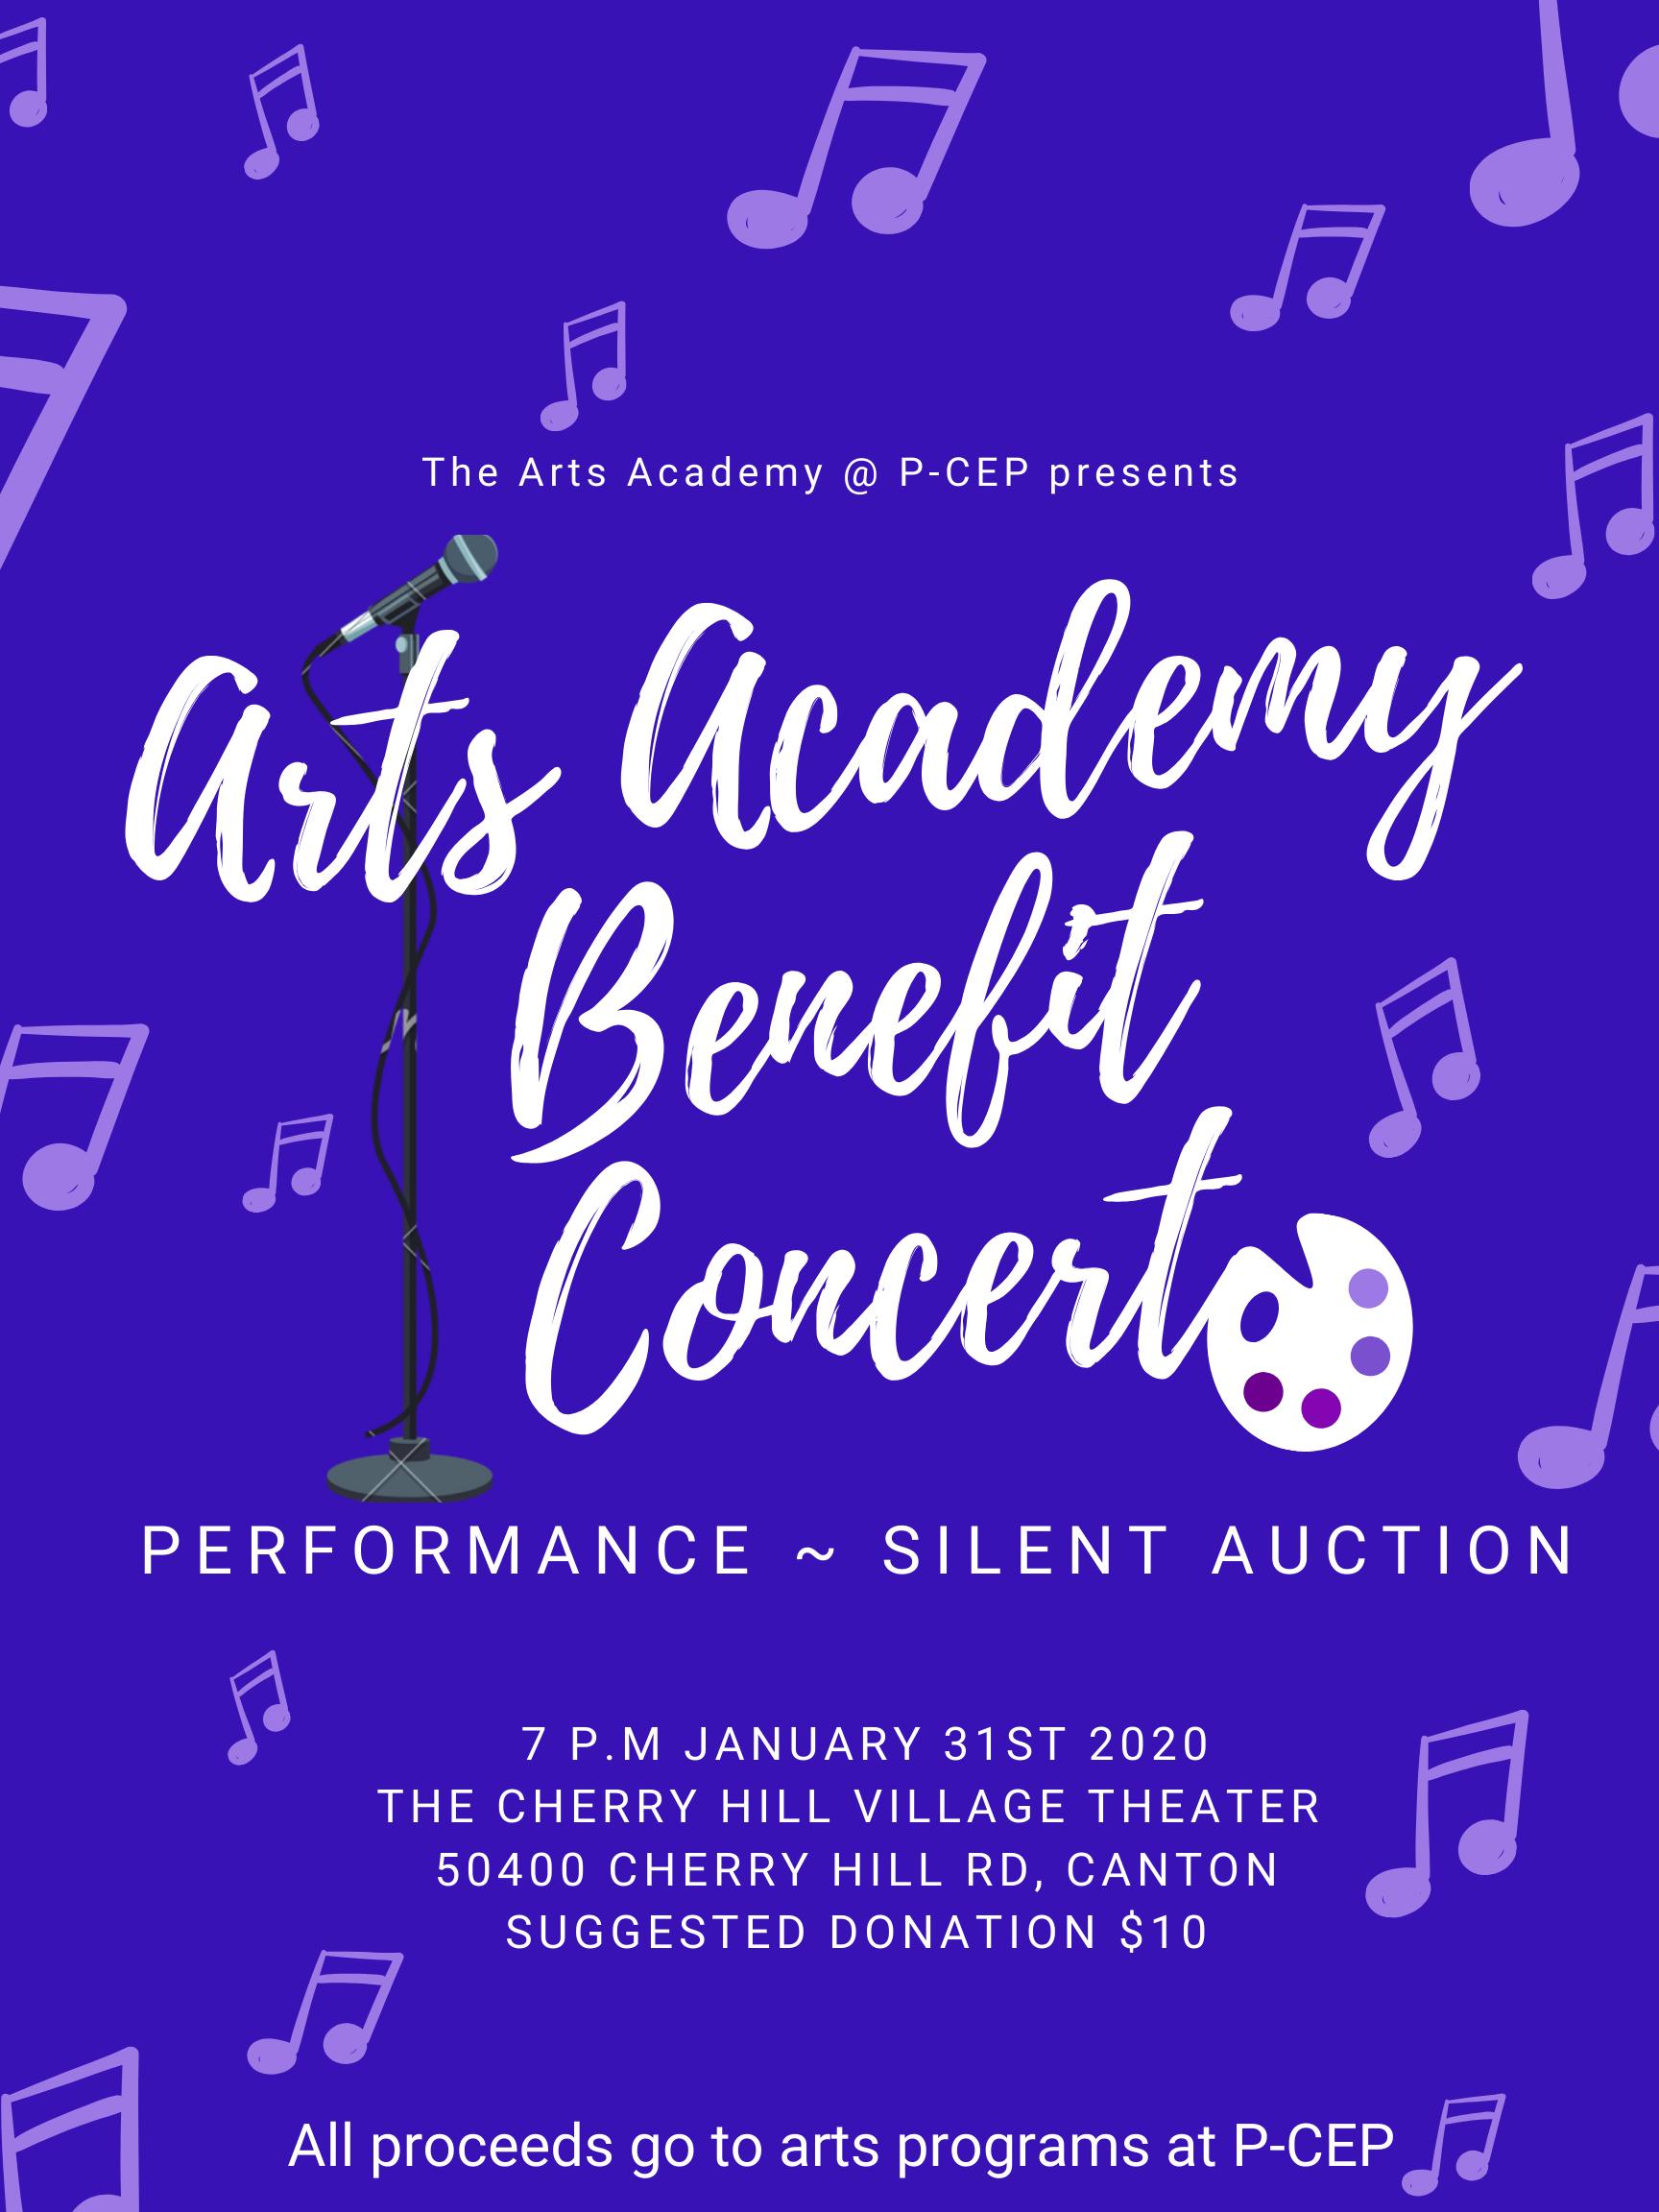 P-CEP Arts Academy Benefit Concert Jan. 31